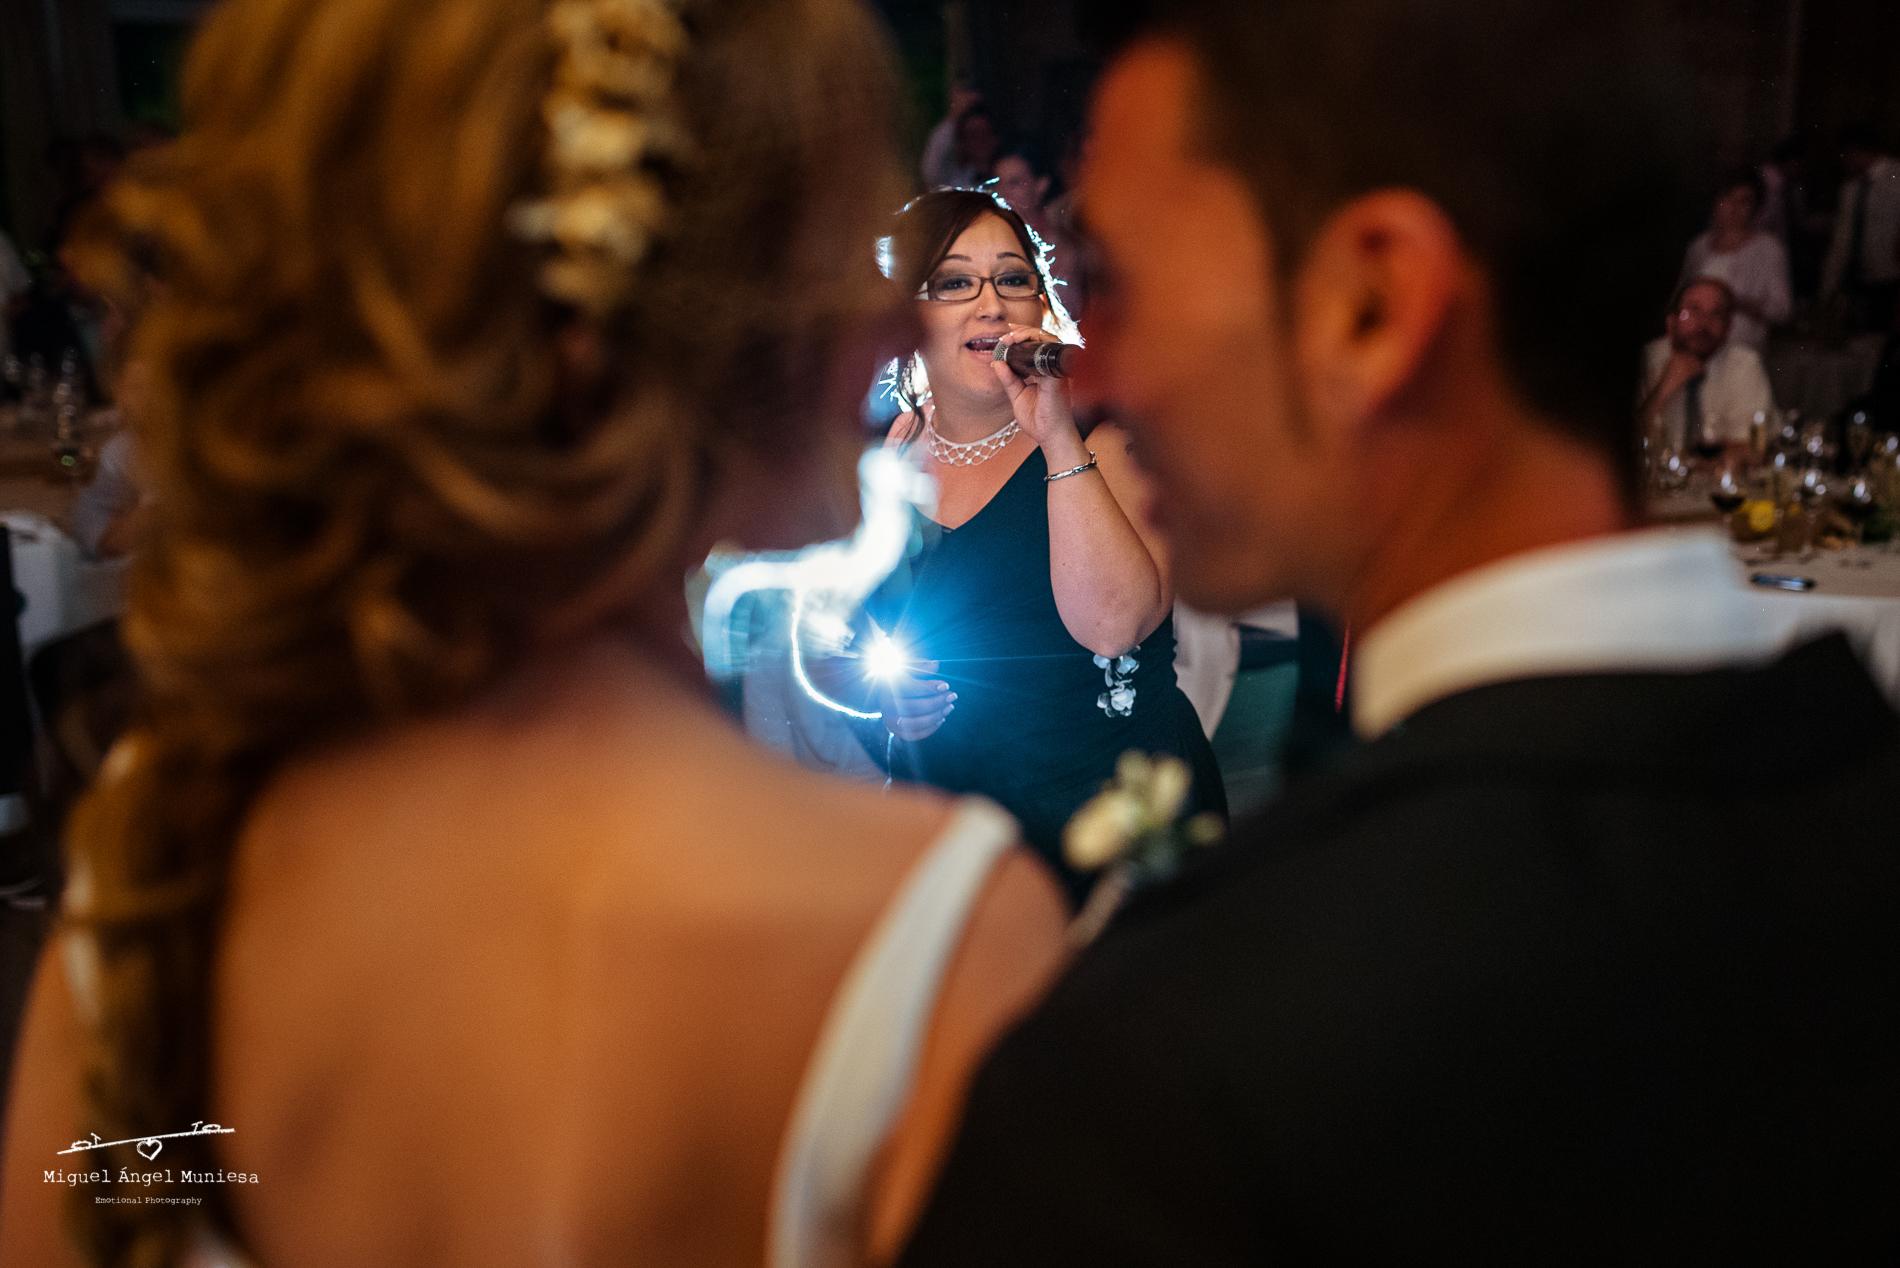 boda, fotografia de boda, boda zaragoza, fotografia, wedding, wedding photography, miguel angel muniesa, fotografo boda Zaragoza, fotografo boda, destination wedding_ 040